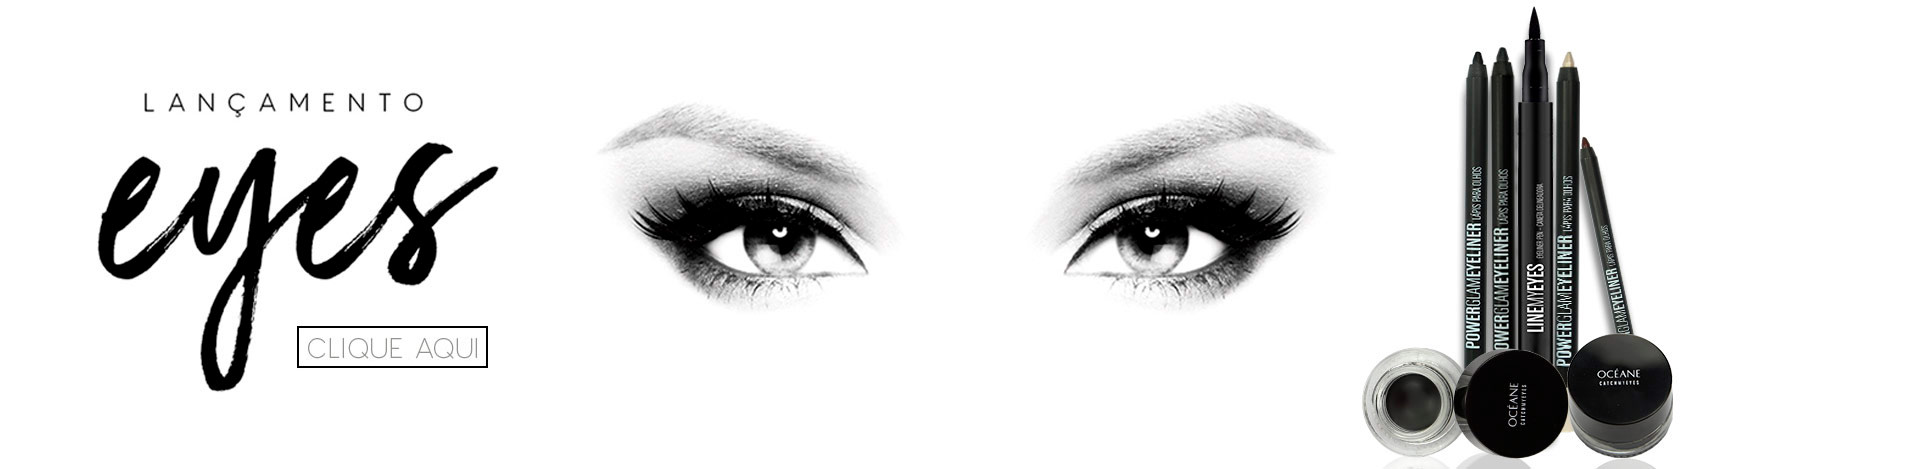 Lançamento eyes